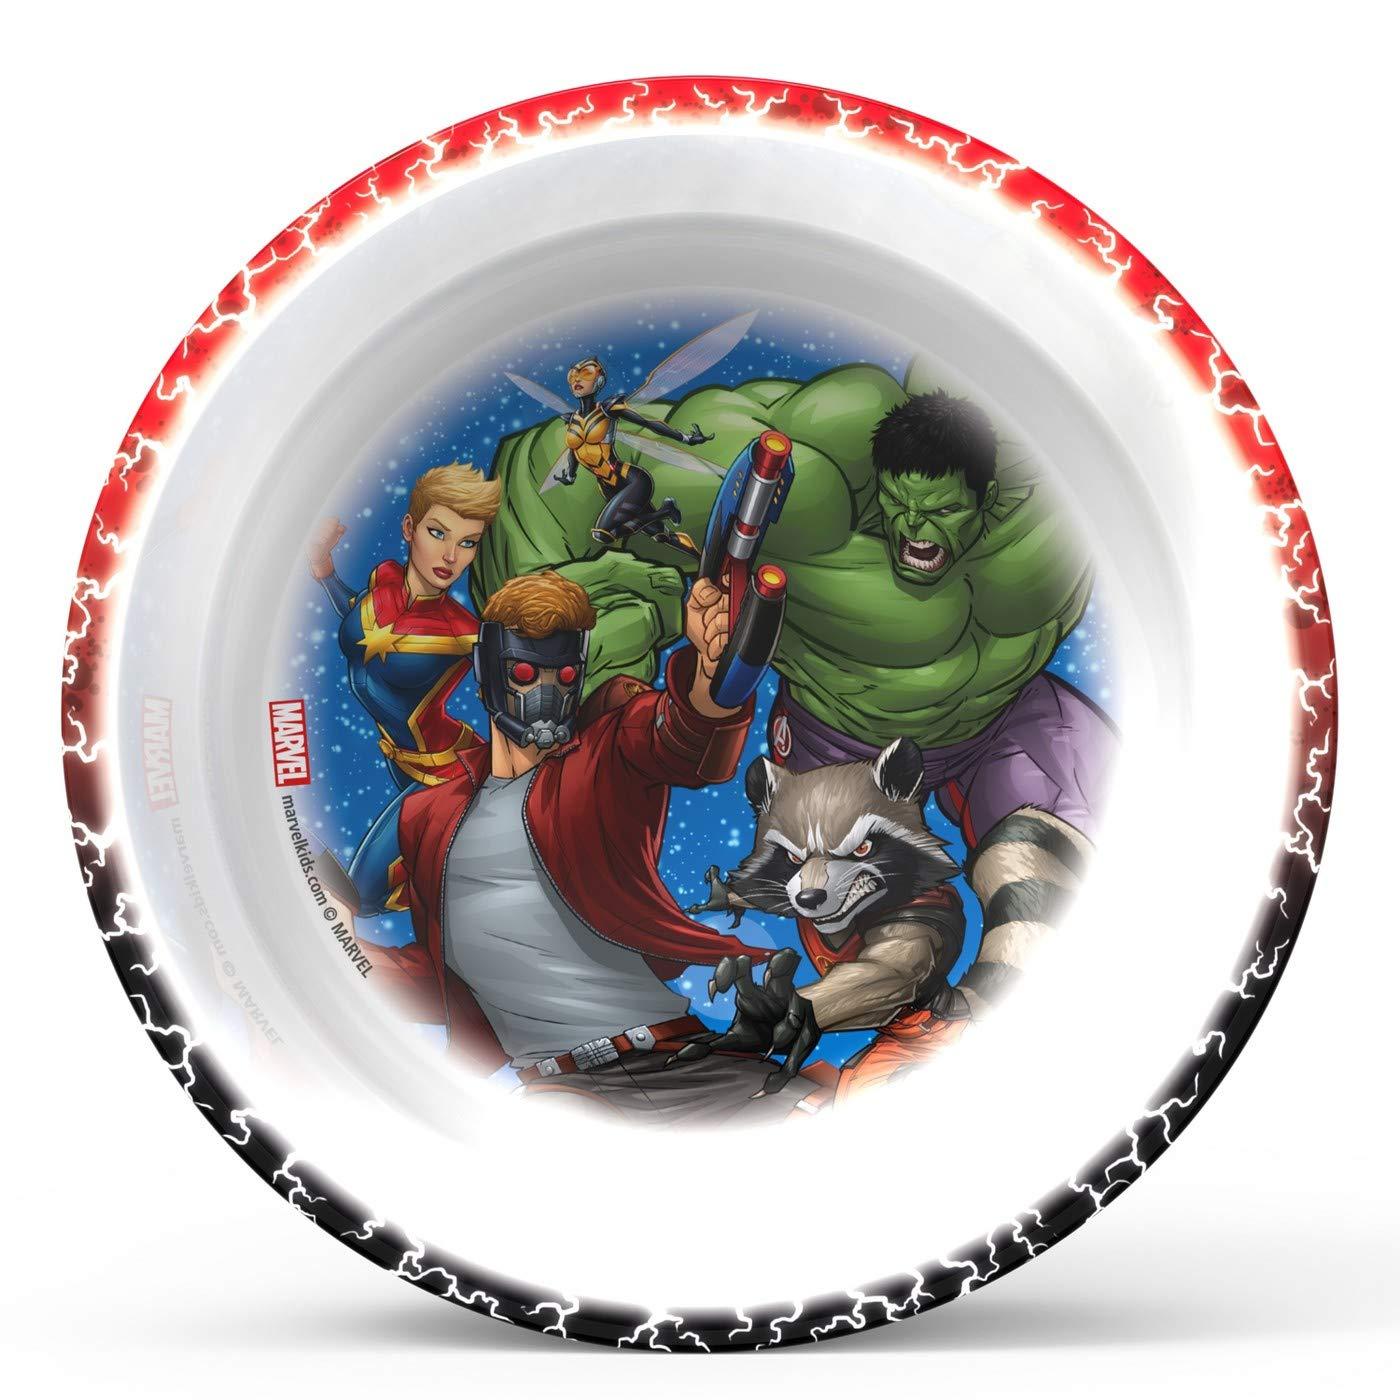 Marvel Infinity War Mealtime 3pcs Set BPA Free by Zak Designs Set